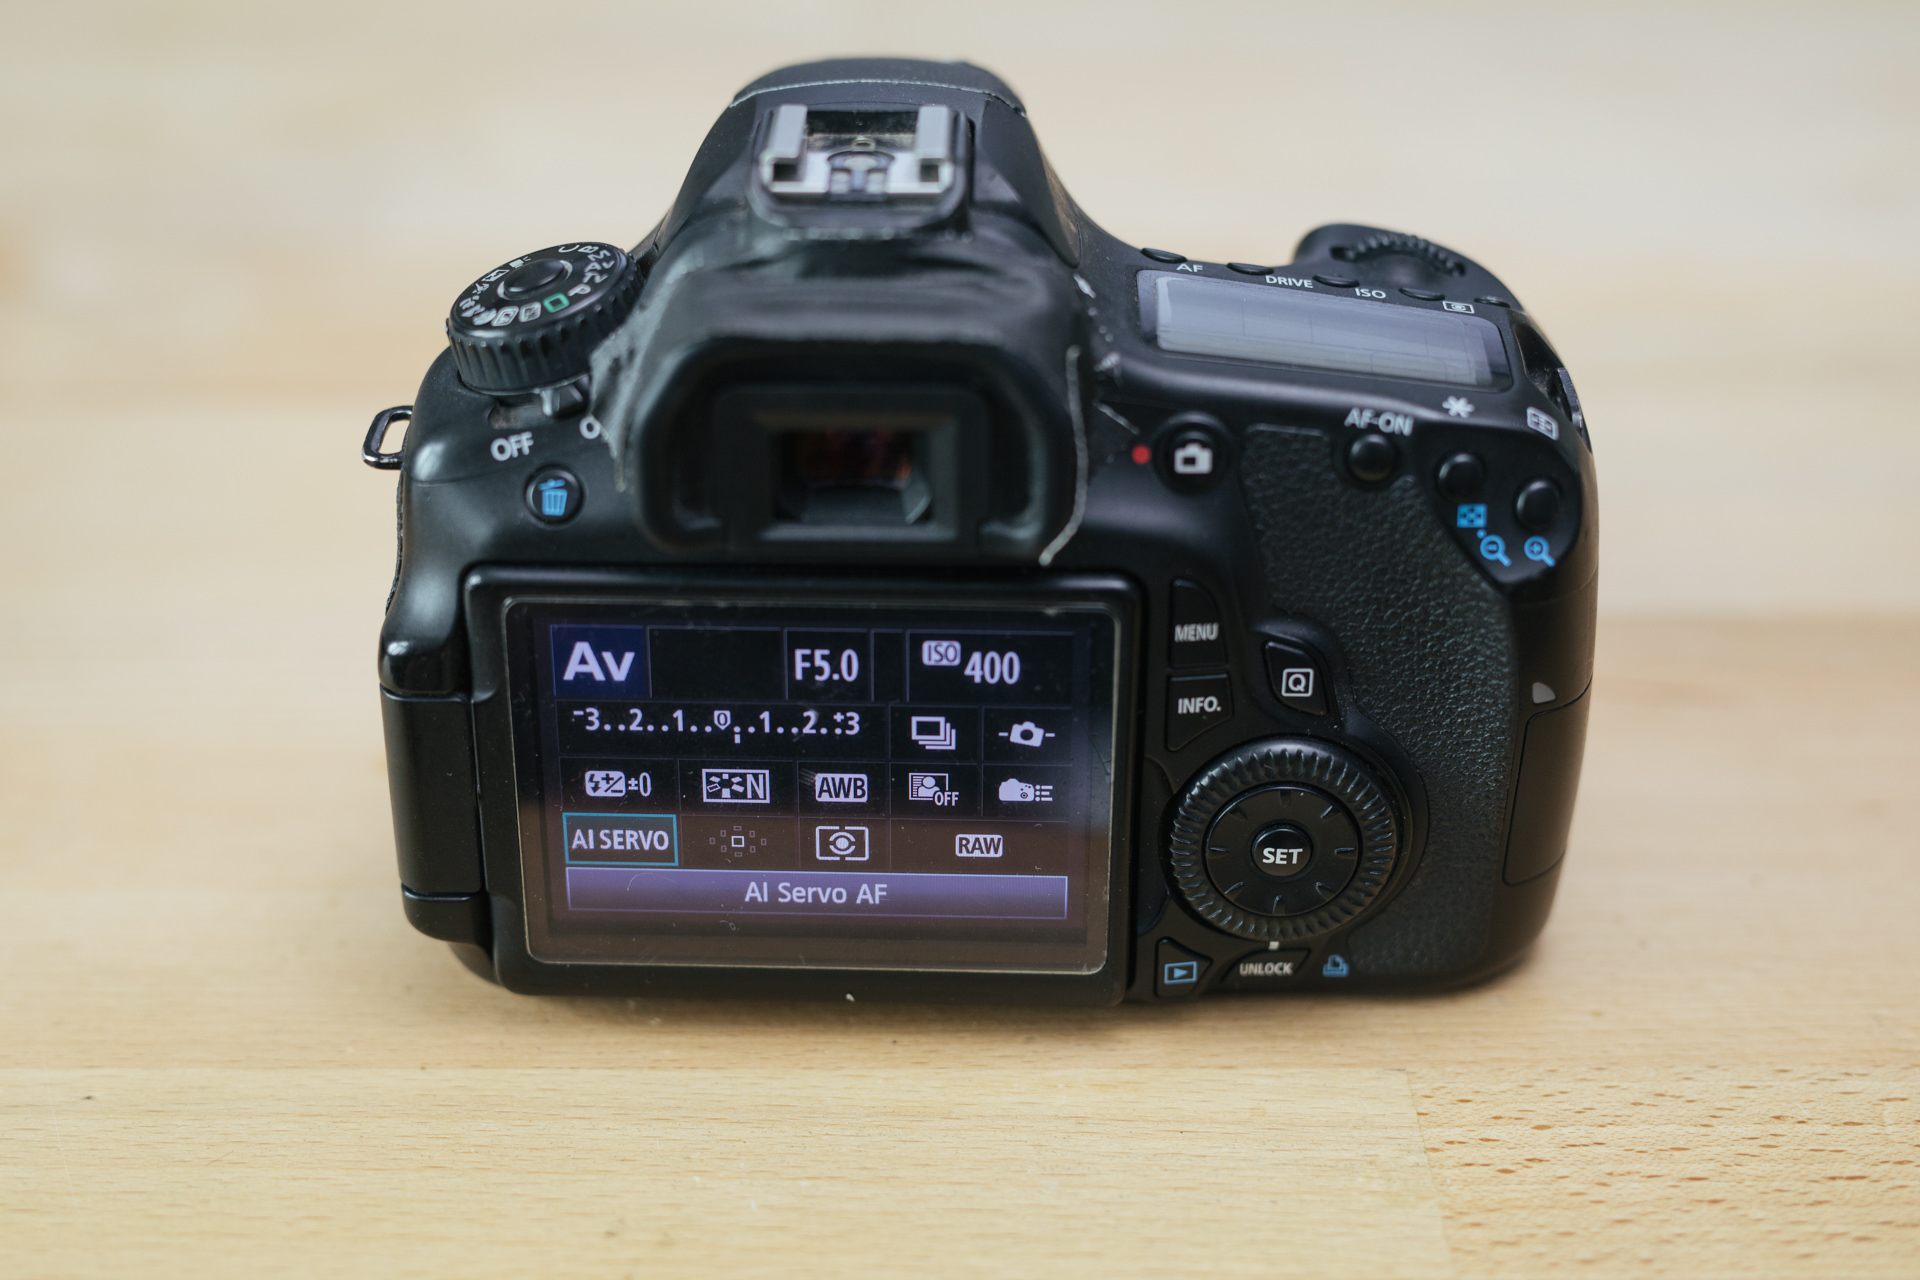 Backbutton Fokus bei Canon Kameras aktivieren